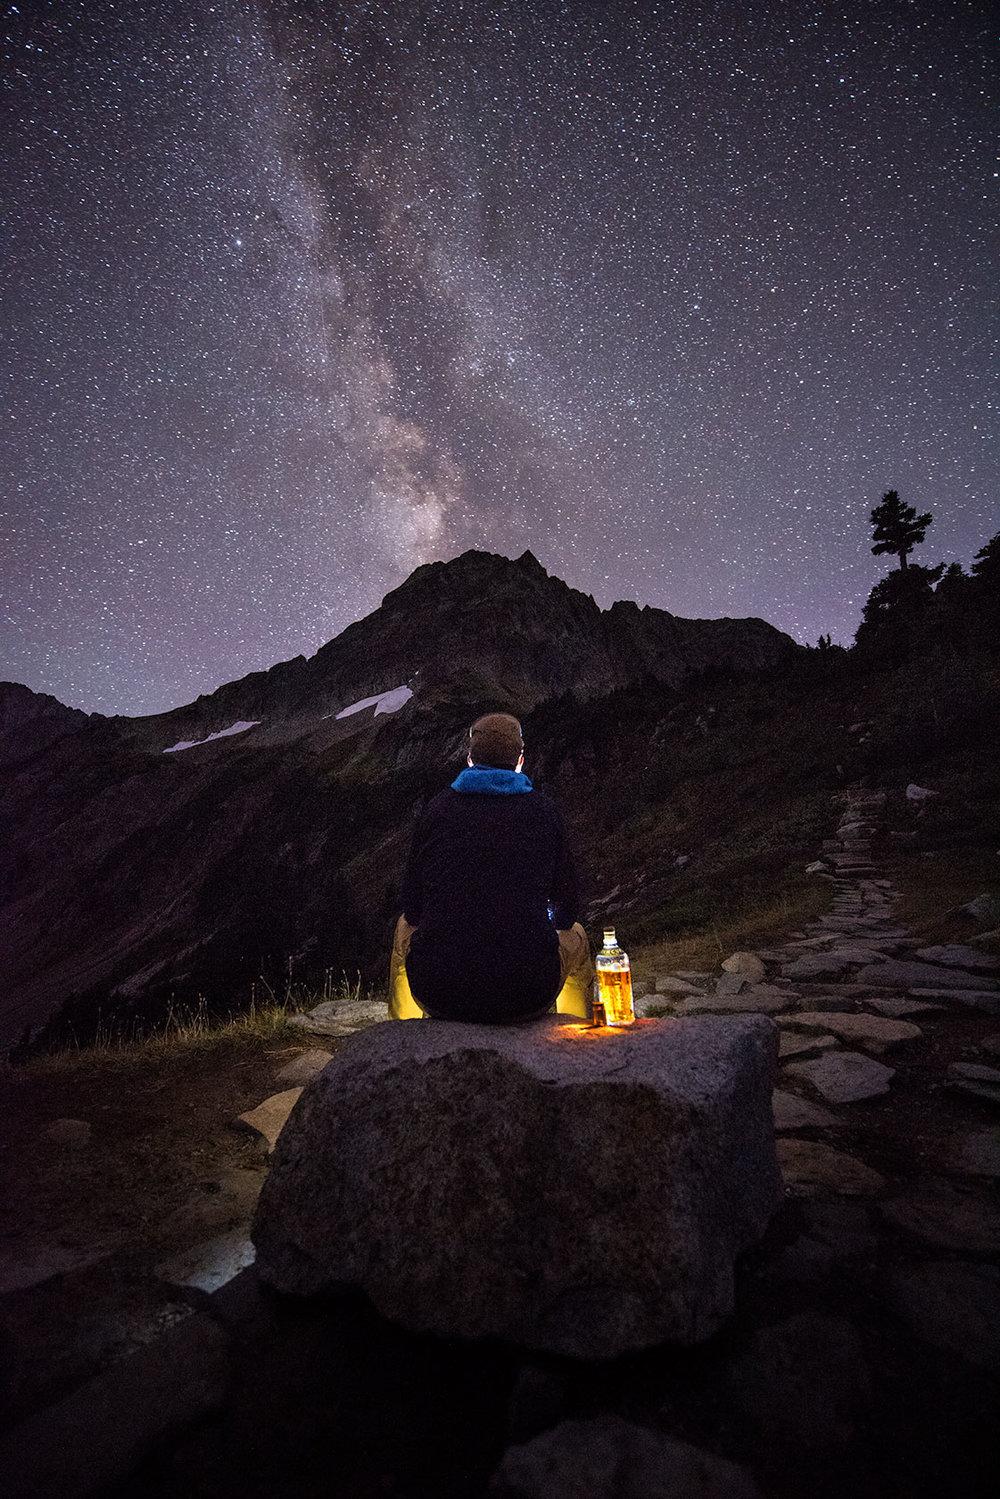 austin-trigg-whiskey-lifestyle-washington-night-hike-milky-way.jpg